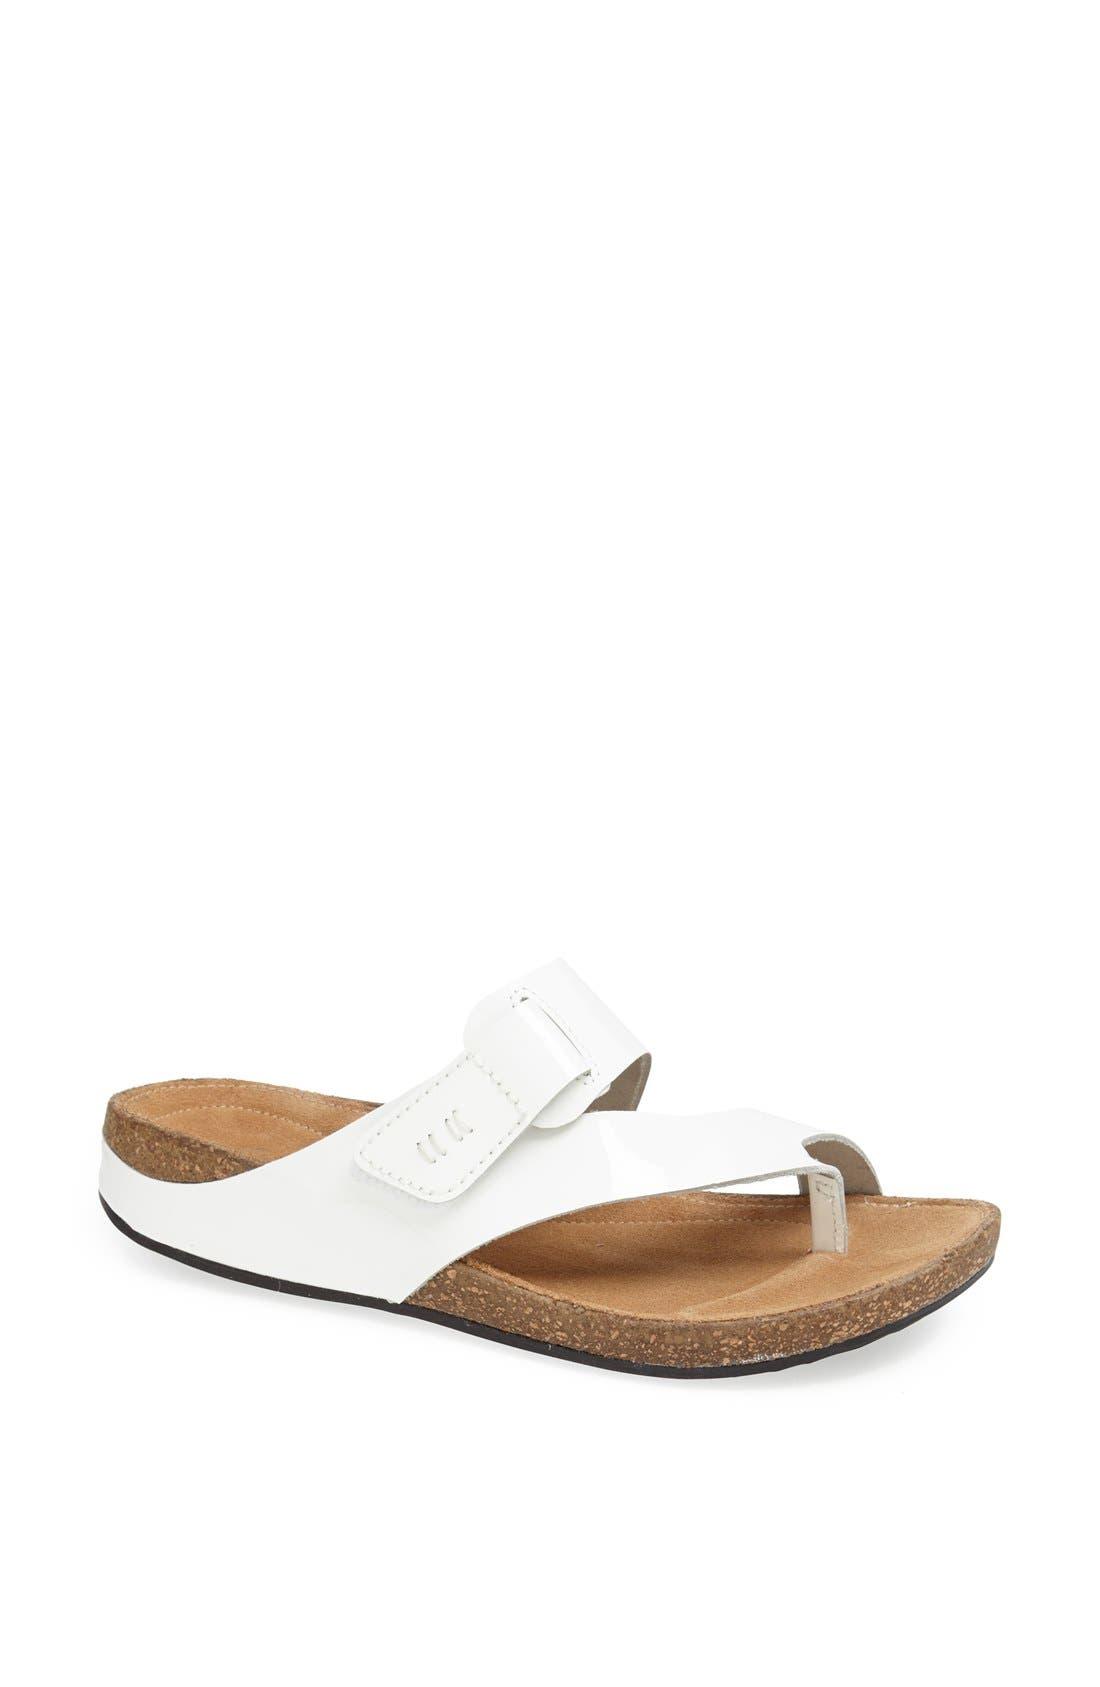 'Perri Coast' Leather Thong Sandal,                         Main,                         color, White Patent